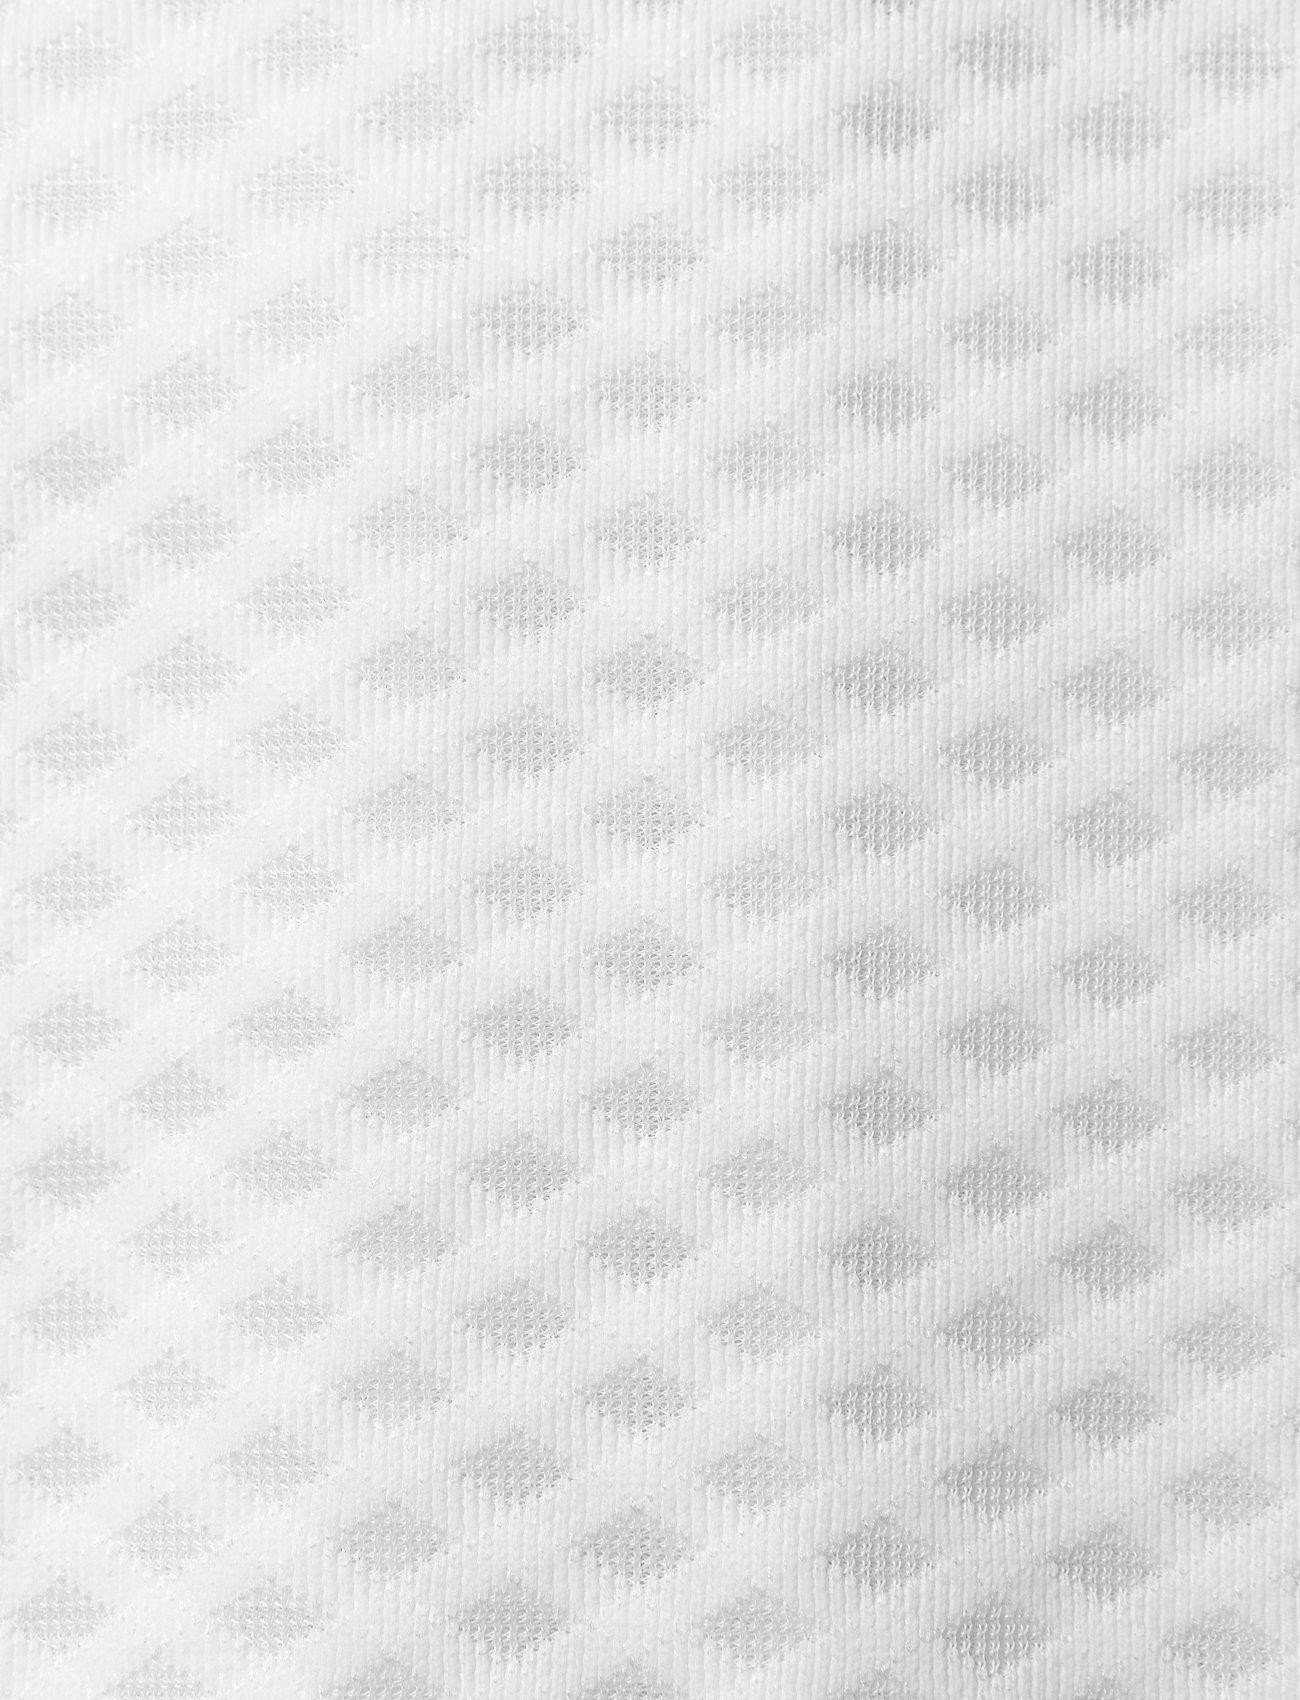 Zne Trans Tt Jacket (030/white) (719.40 kr) - adidas Tennis